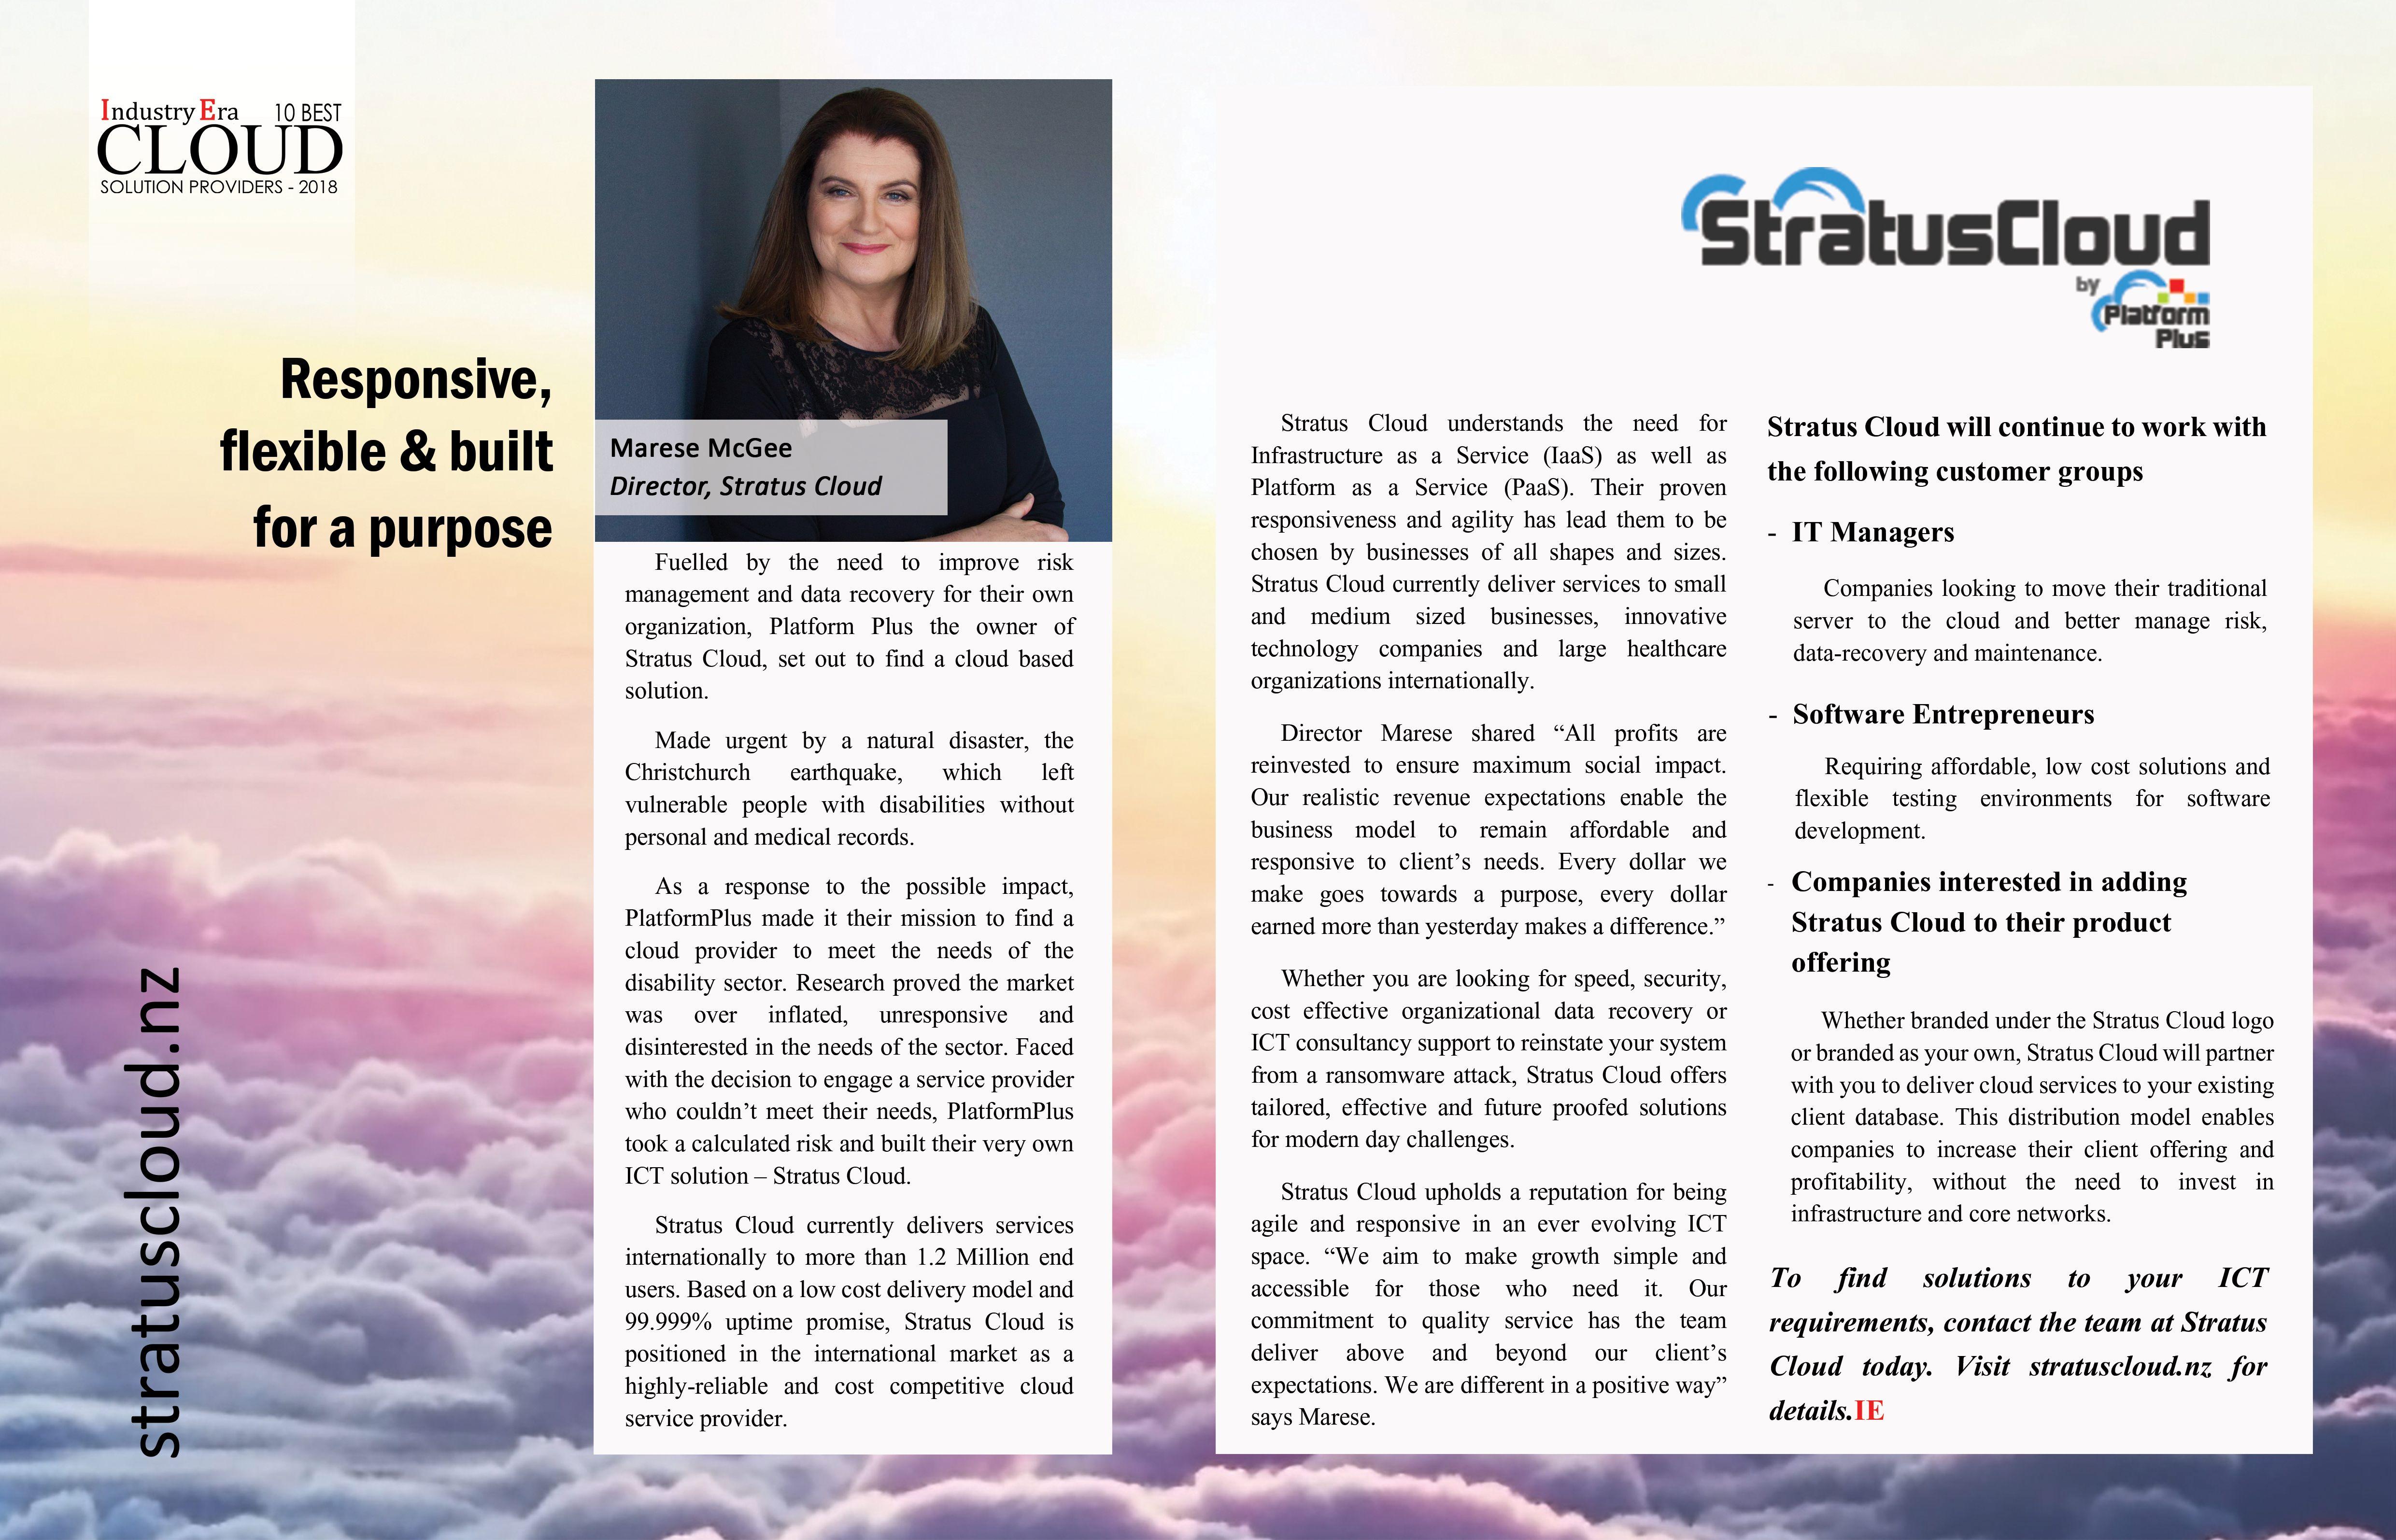 Startus Cloud - Responsive, flexible & built for a purpose in 2019